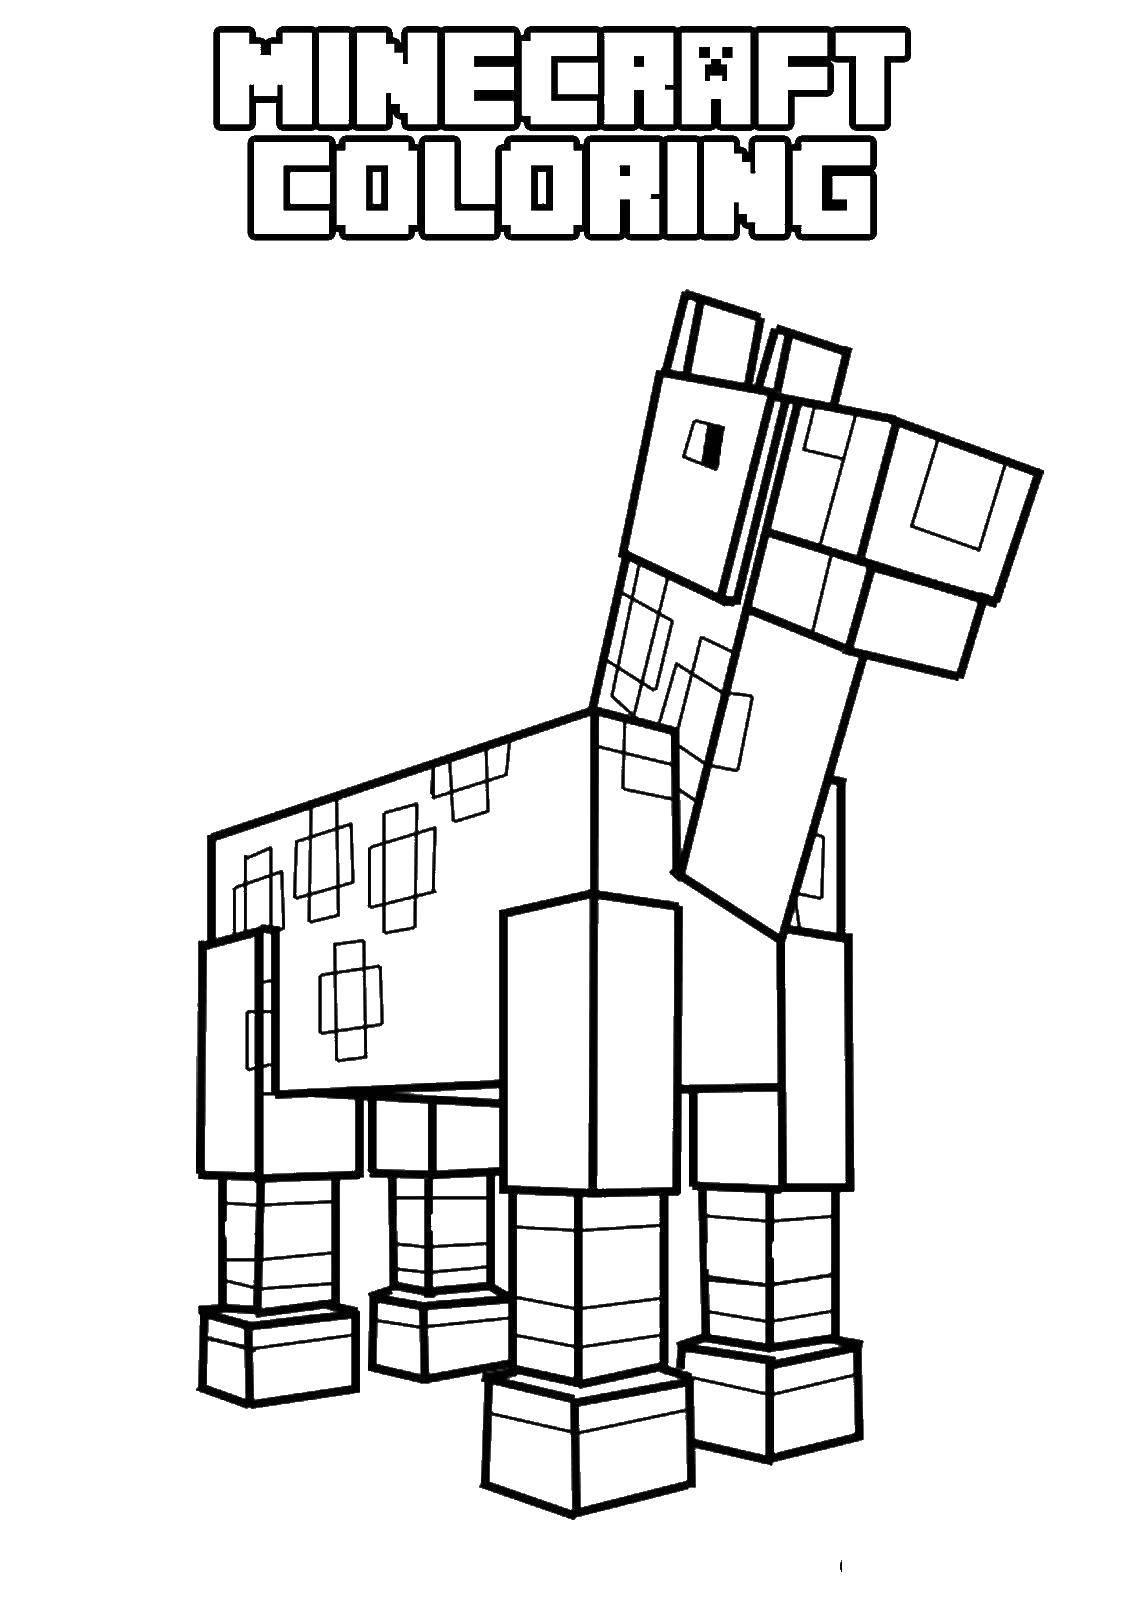 Раскраска Майнкрафт лошадь Скачать майнкрафт , лошадь.  Распечатать ,майнкрафт,